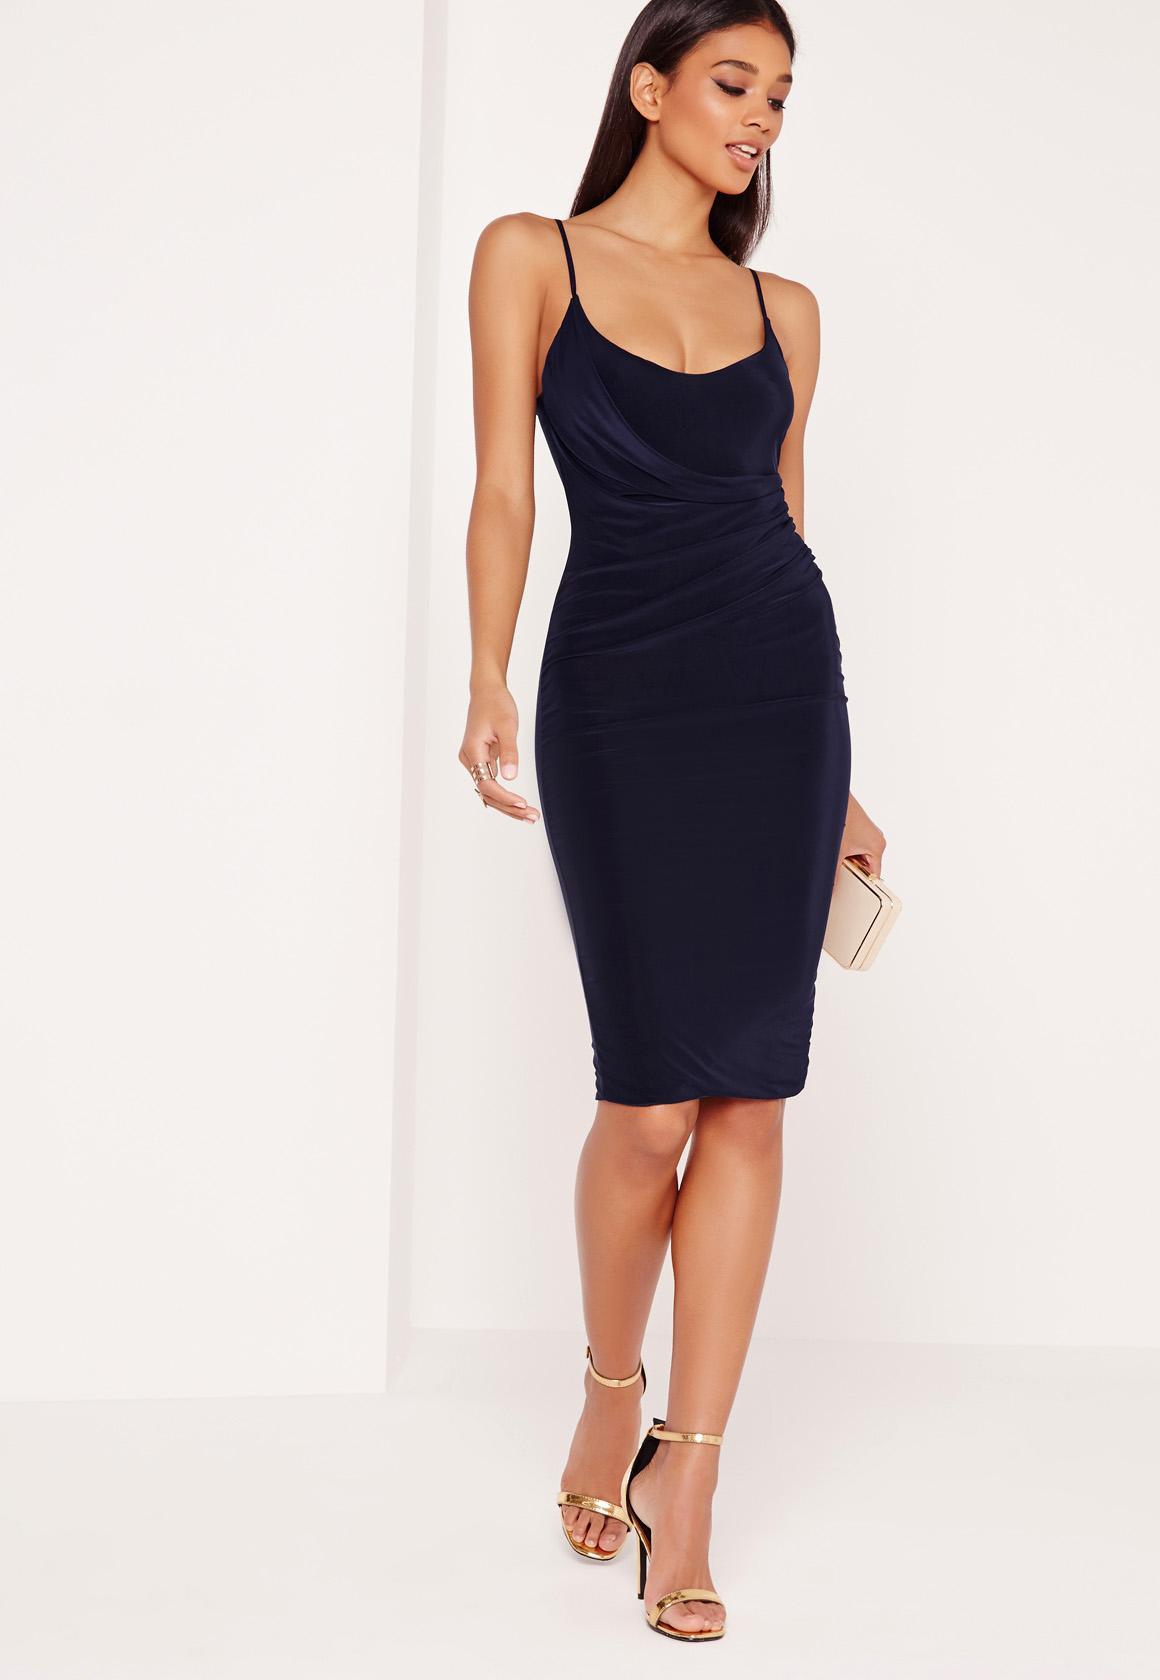 Kim Kardashian Black Shift Dress with Sleeves